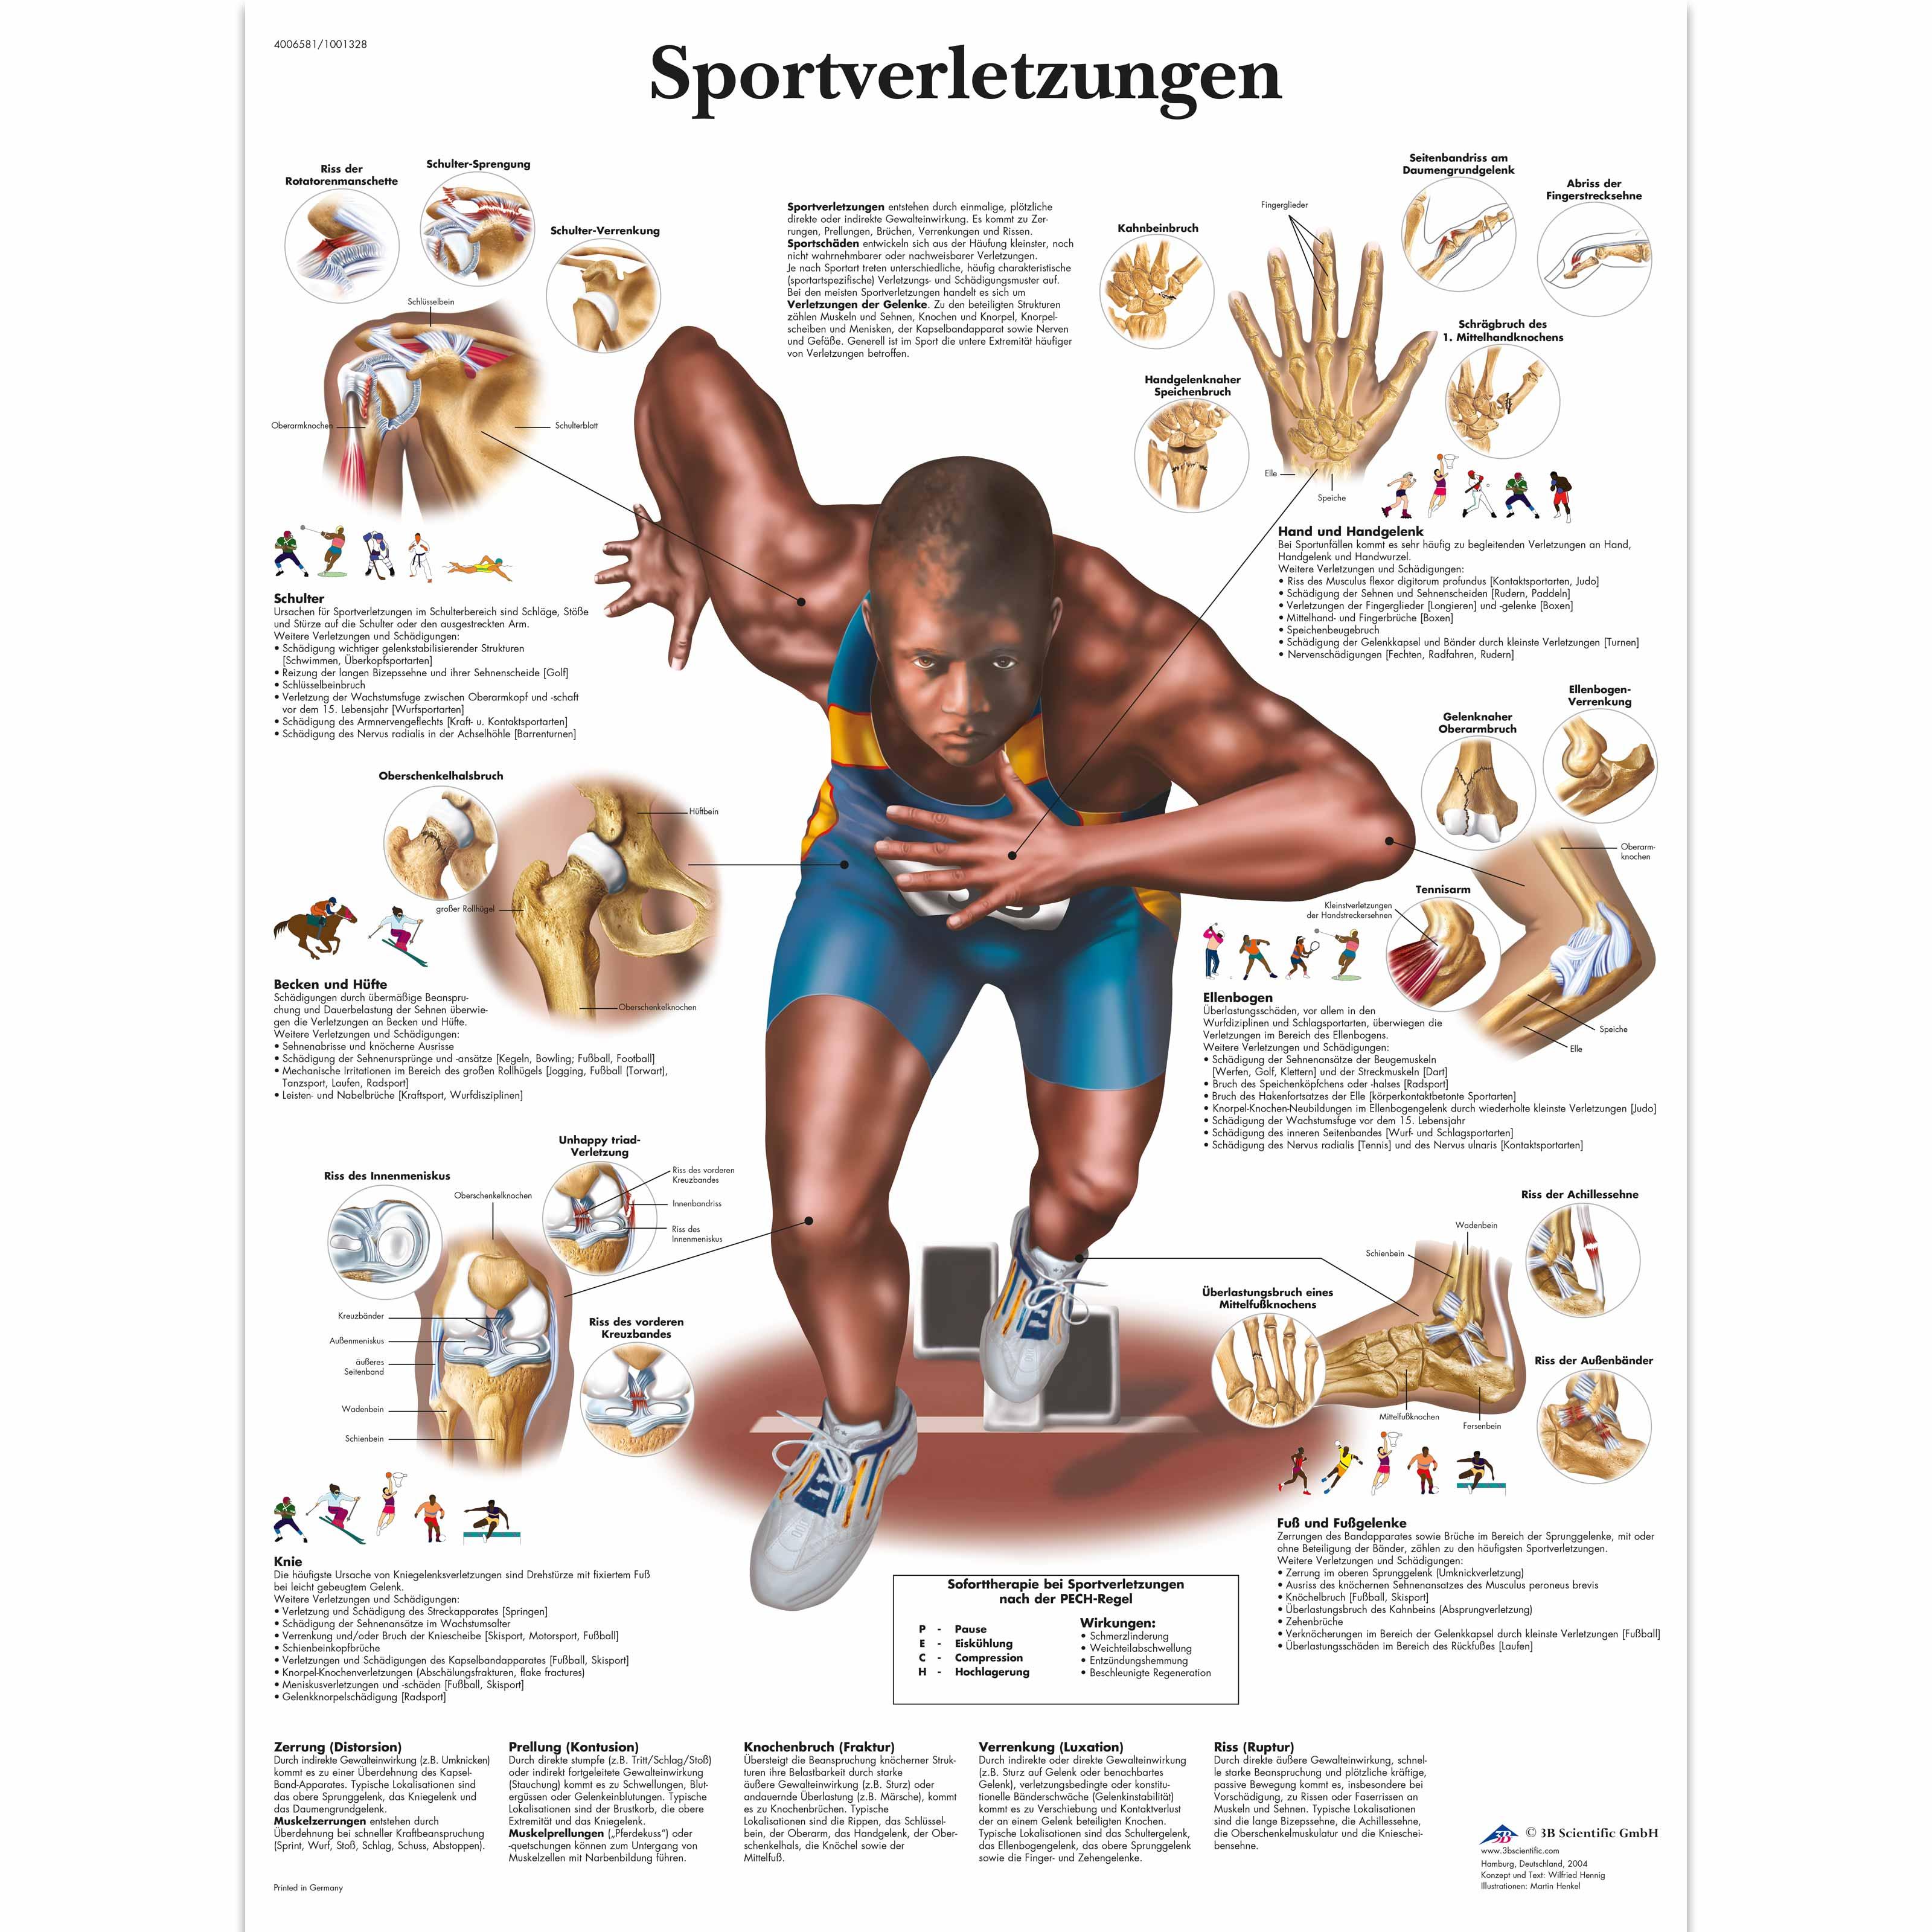 Lehrtafel - Sportverletzungen - 4006581 - VR0188UU - Muskel - 3B ...